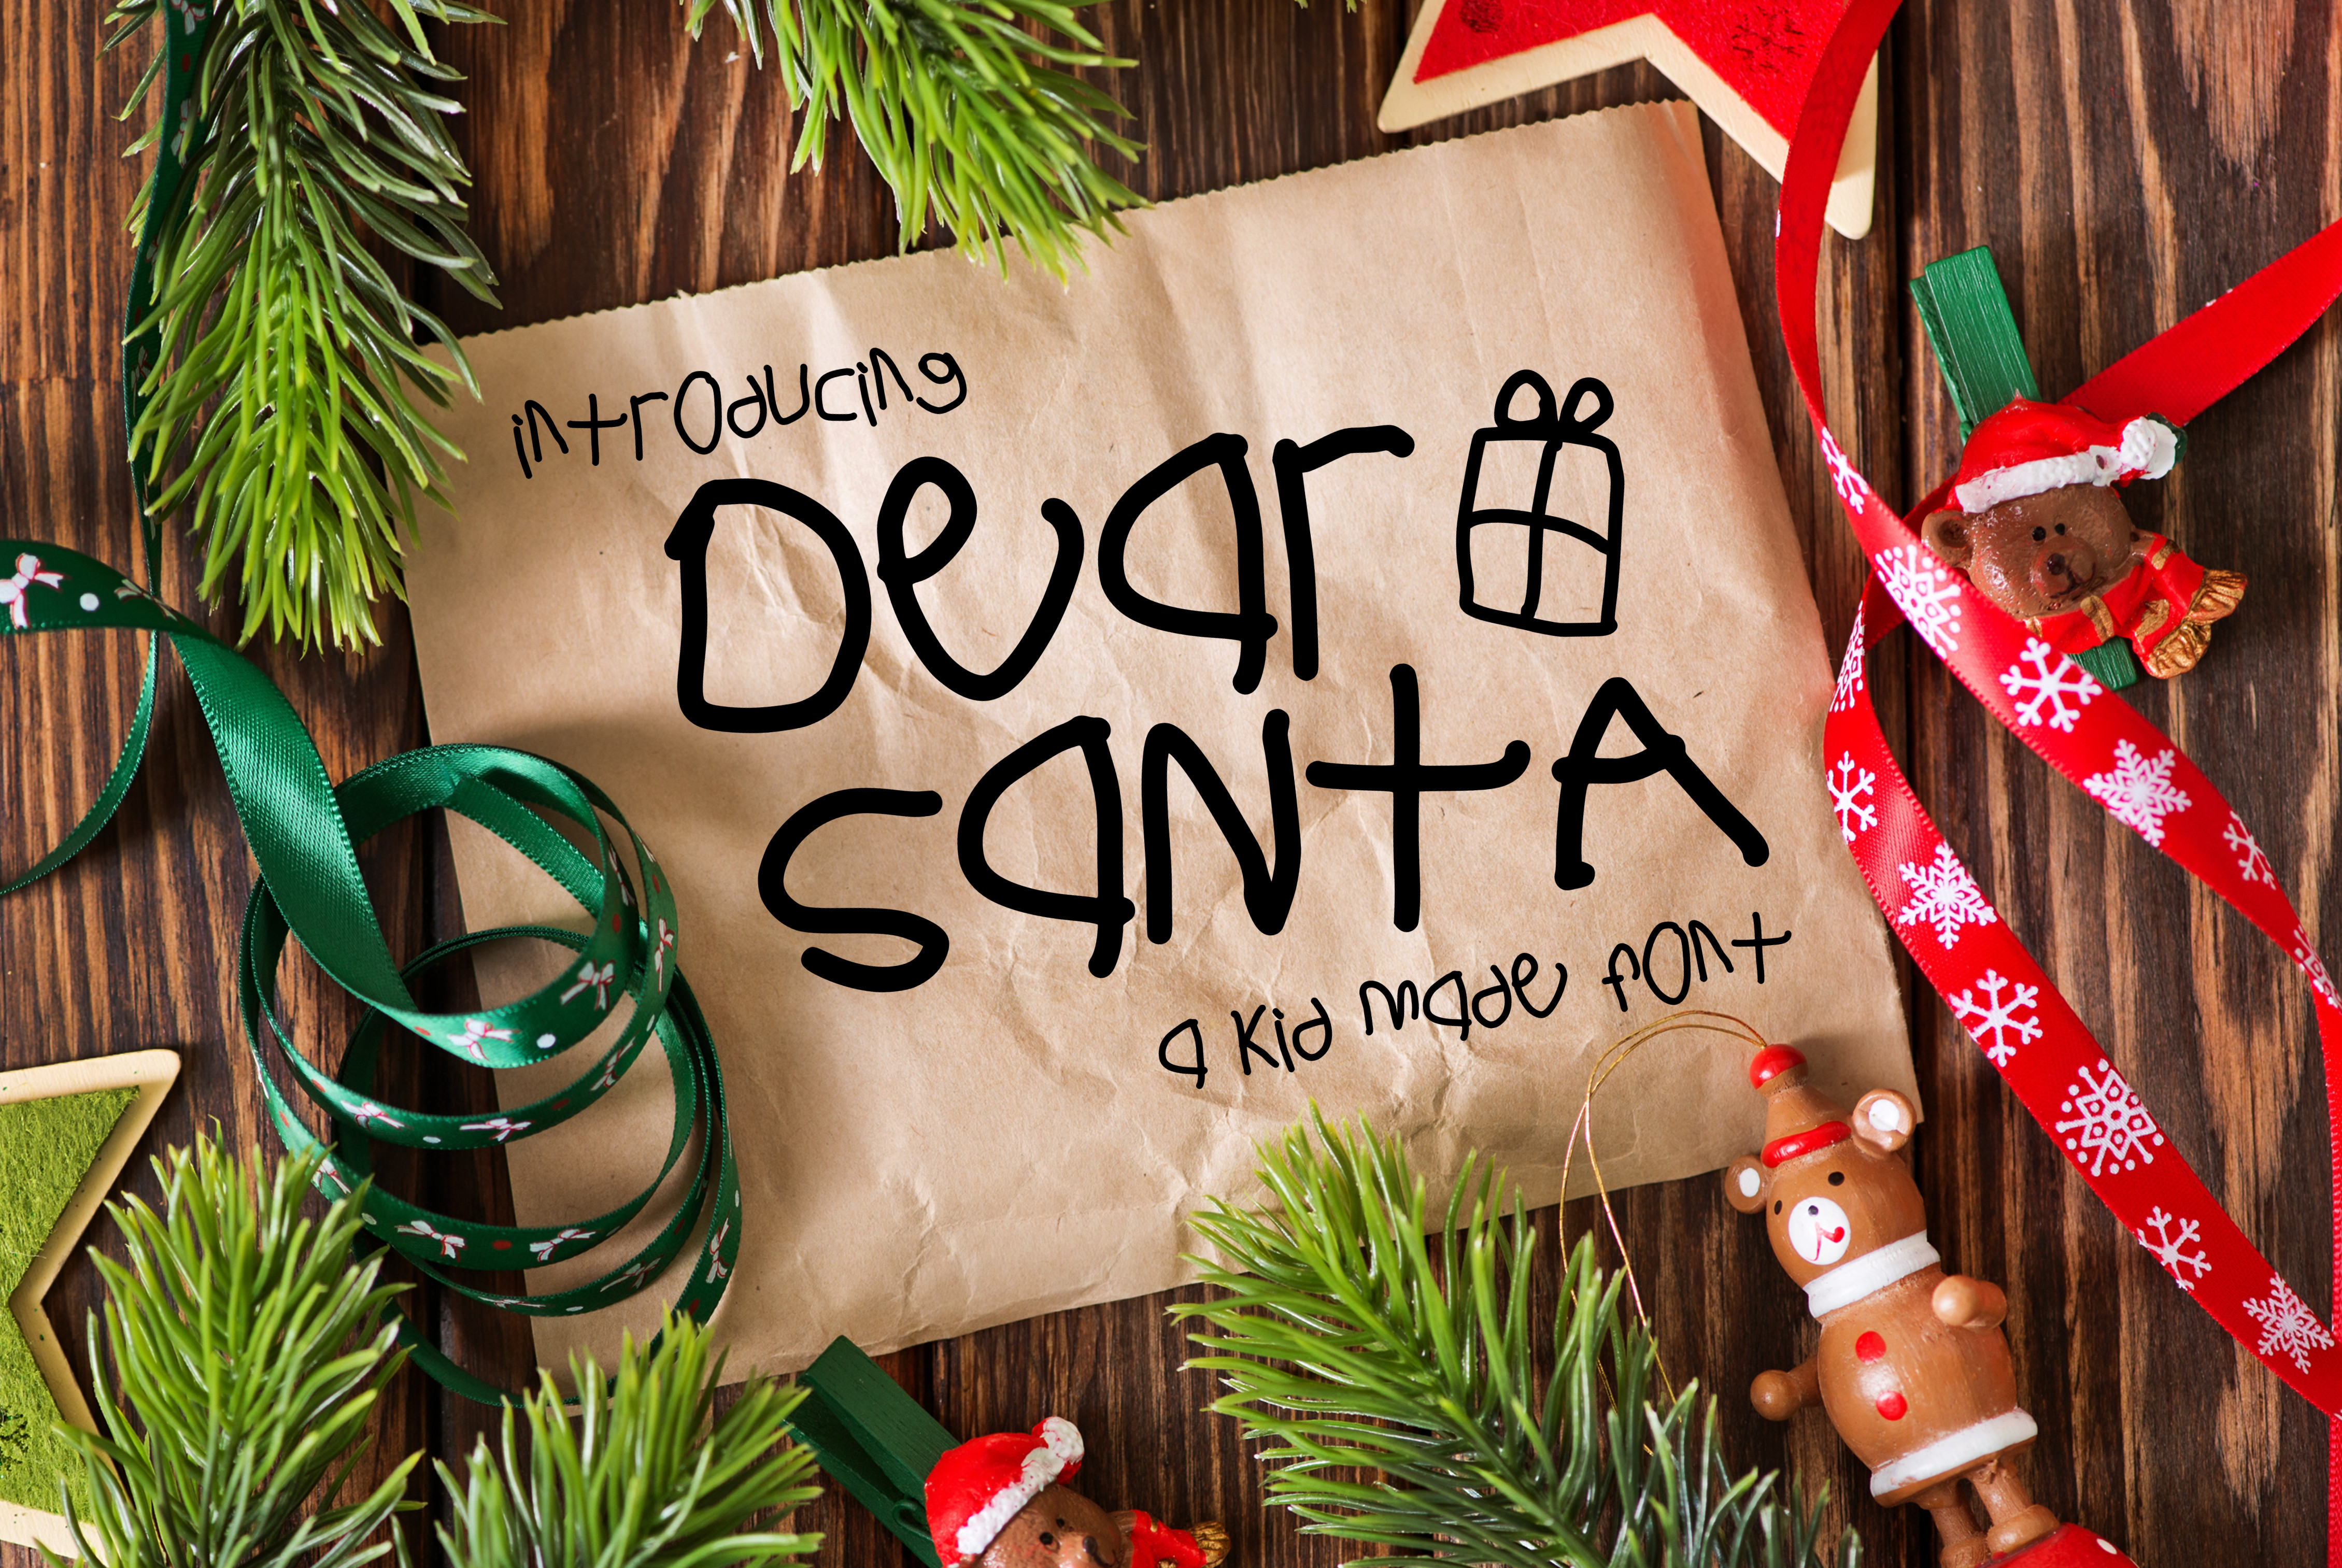 Dear Santa a Kid Made Font example image 1